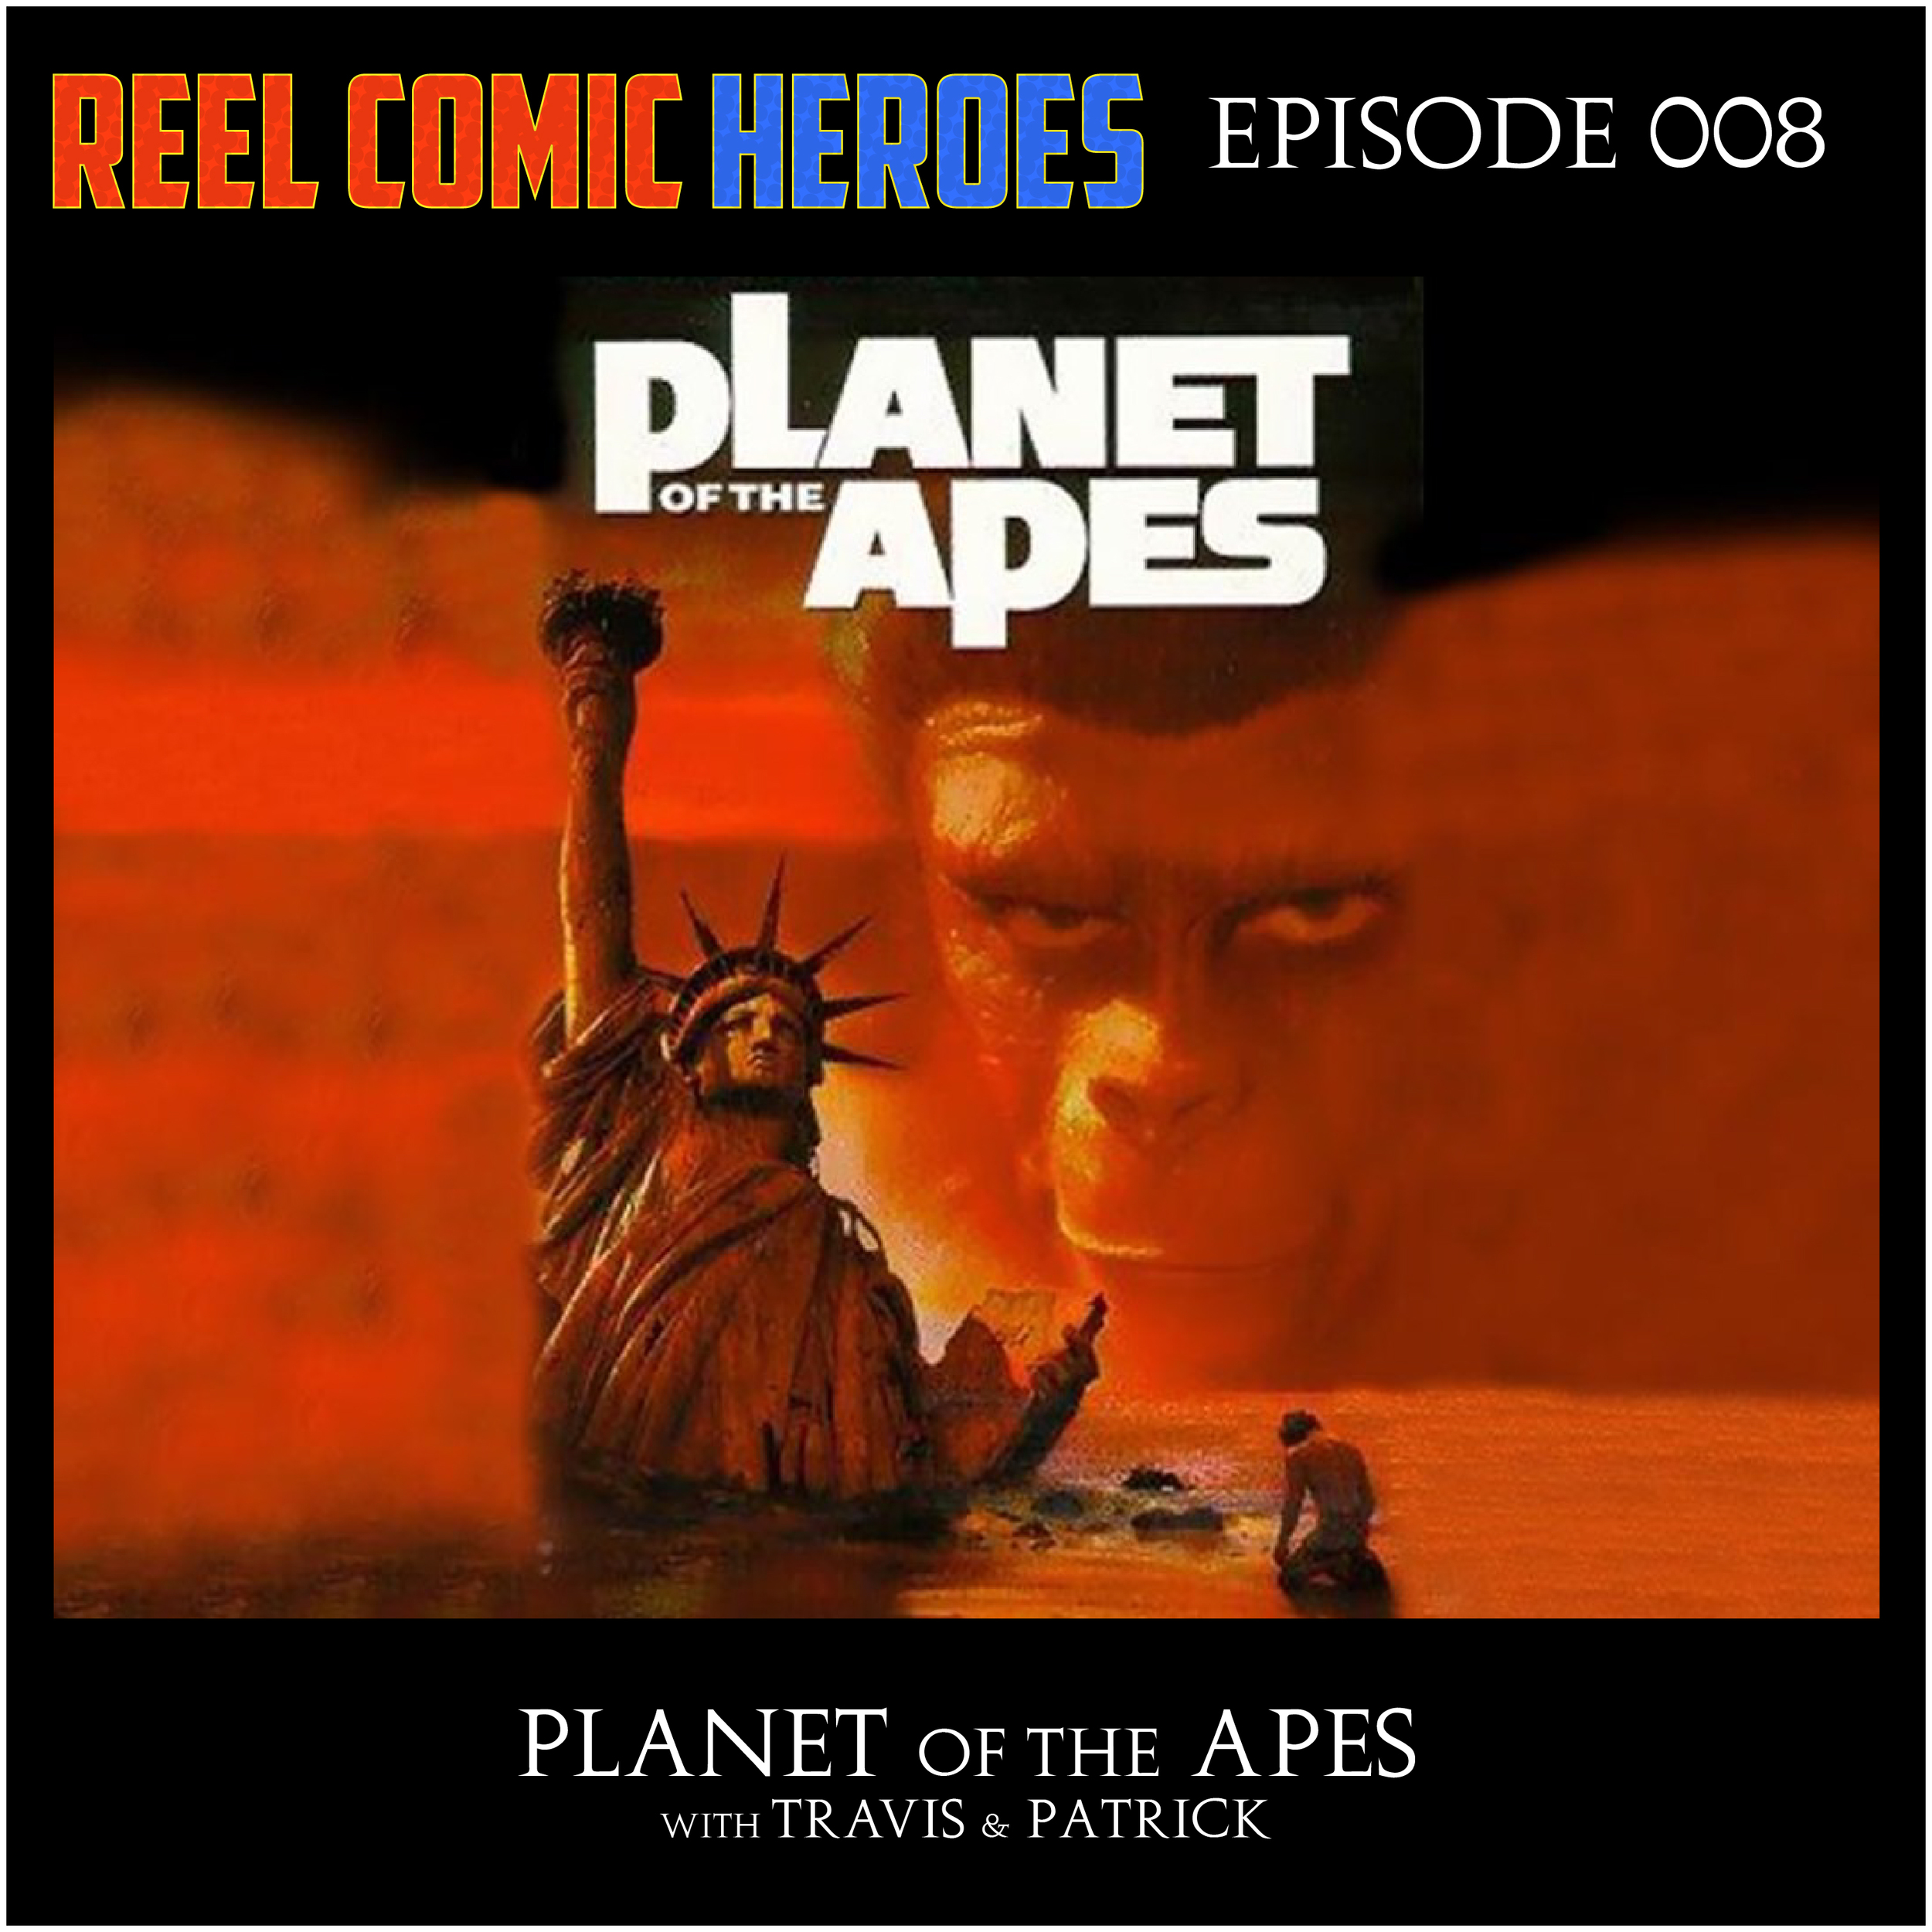 episode008_PlanetOfTheApes-12.jpg